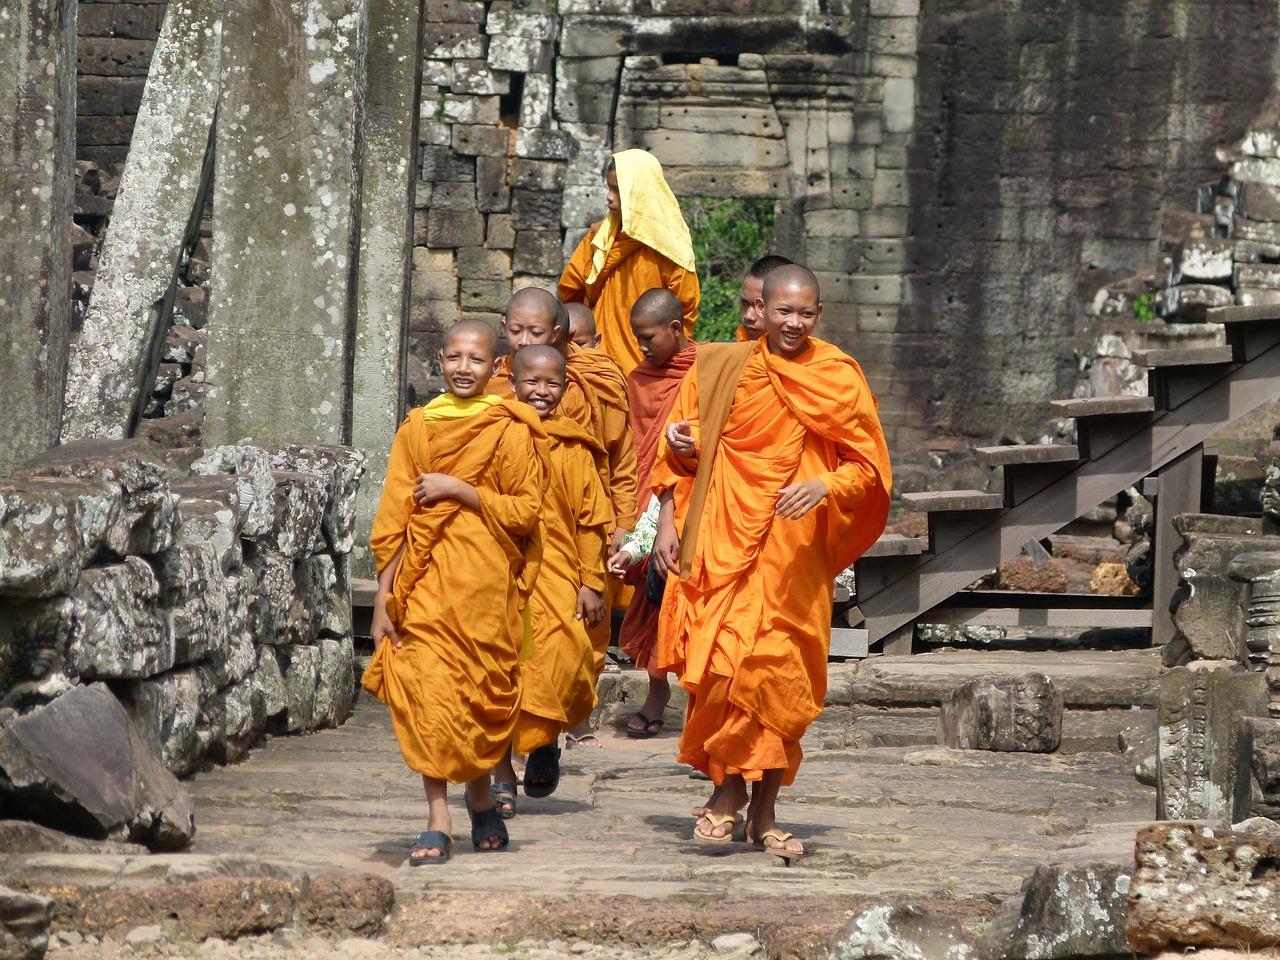 templos del sudeste asiatico